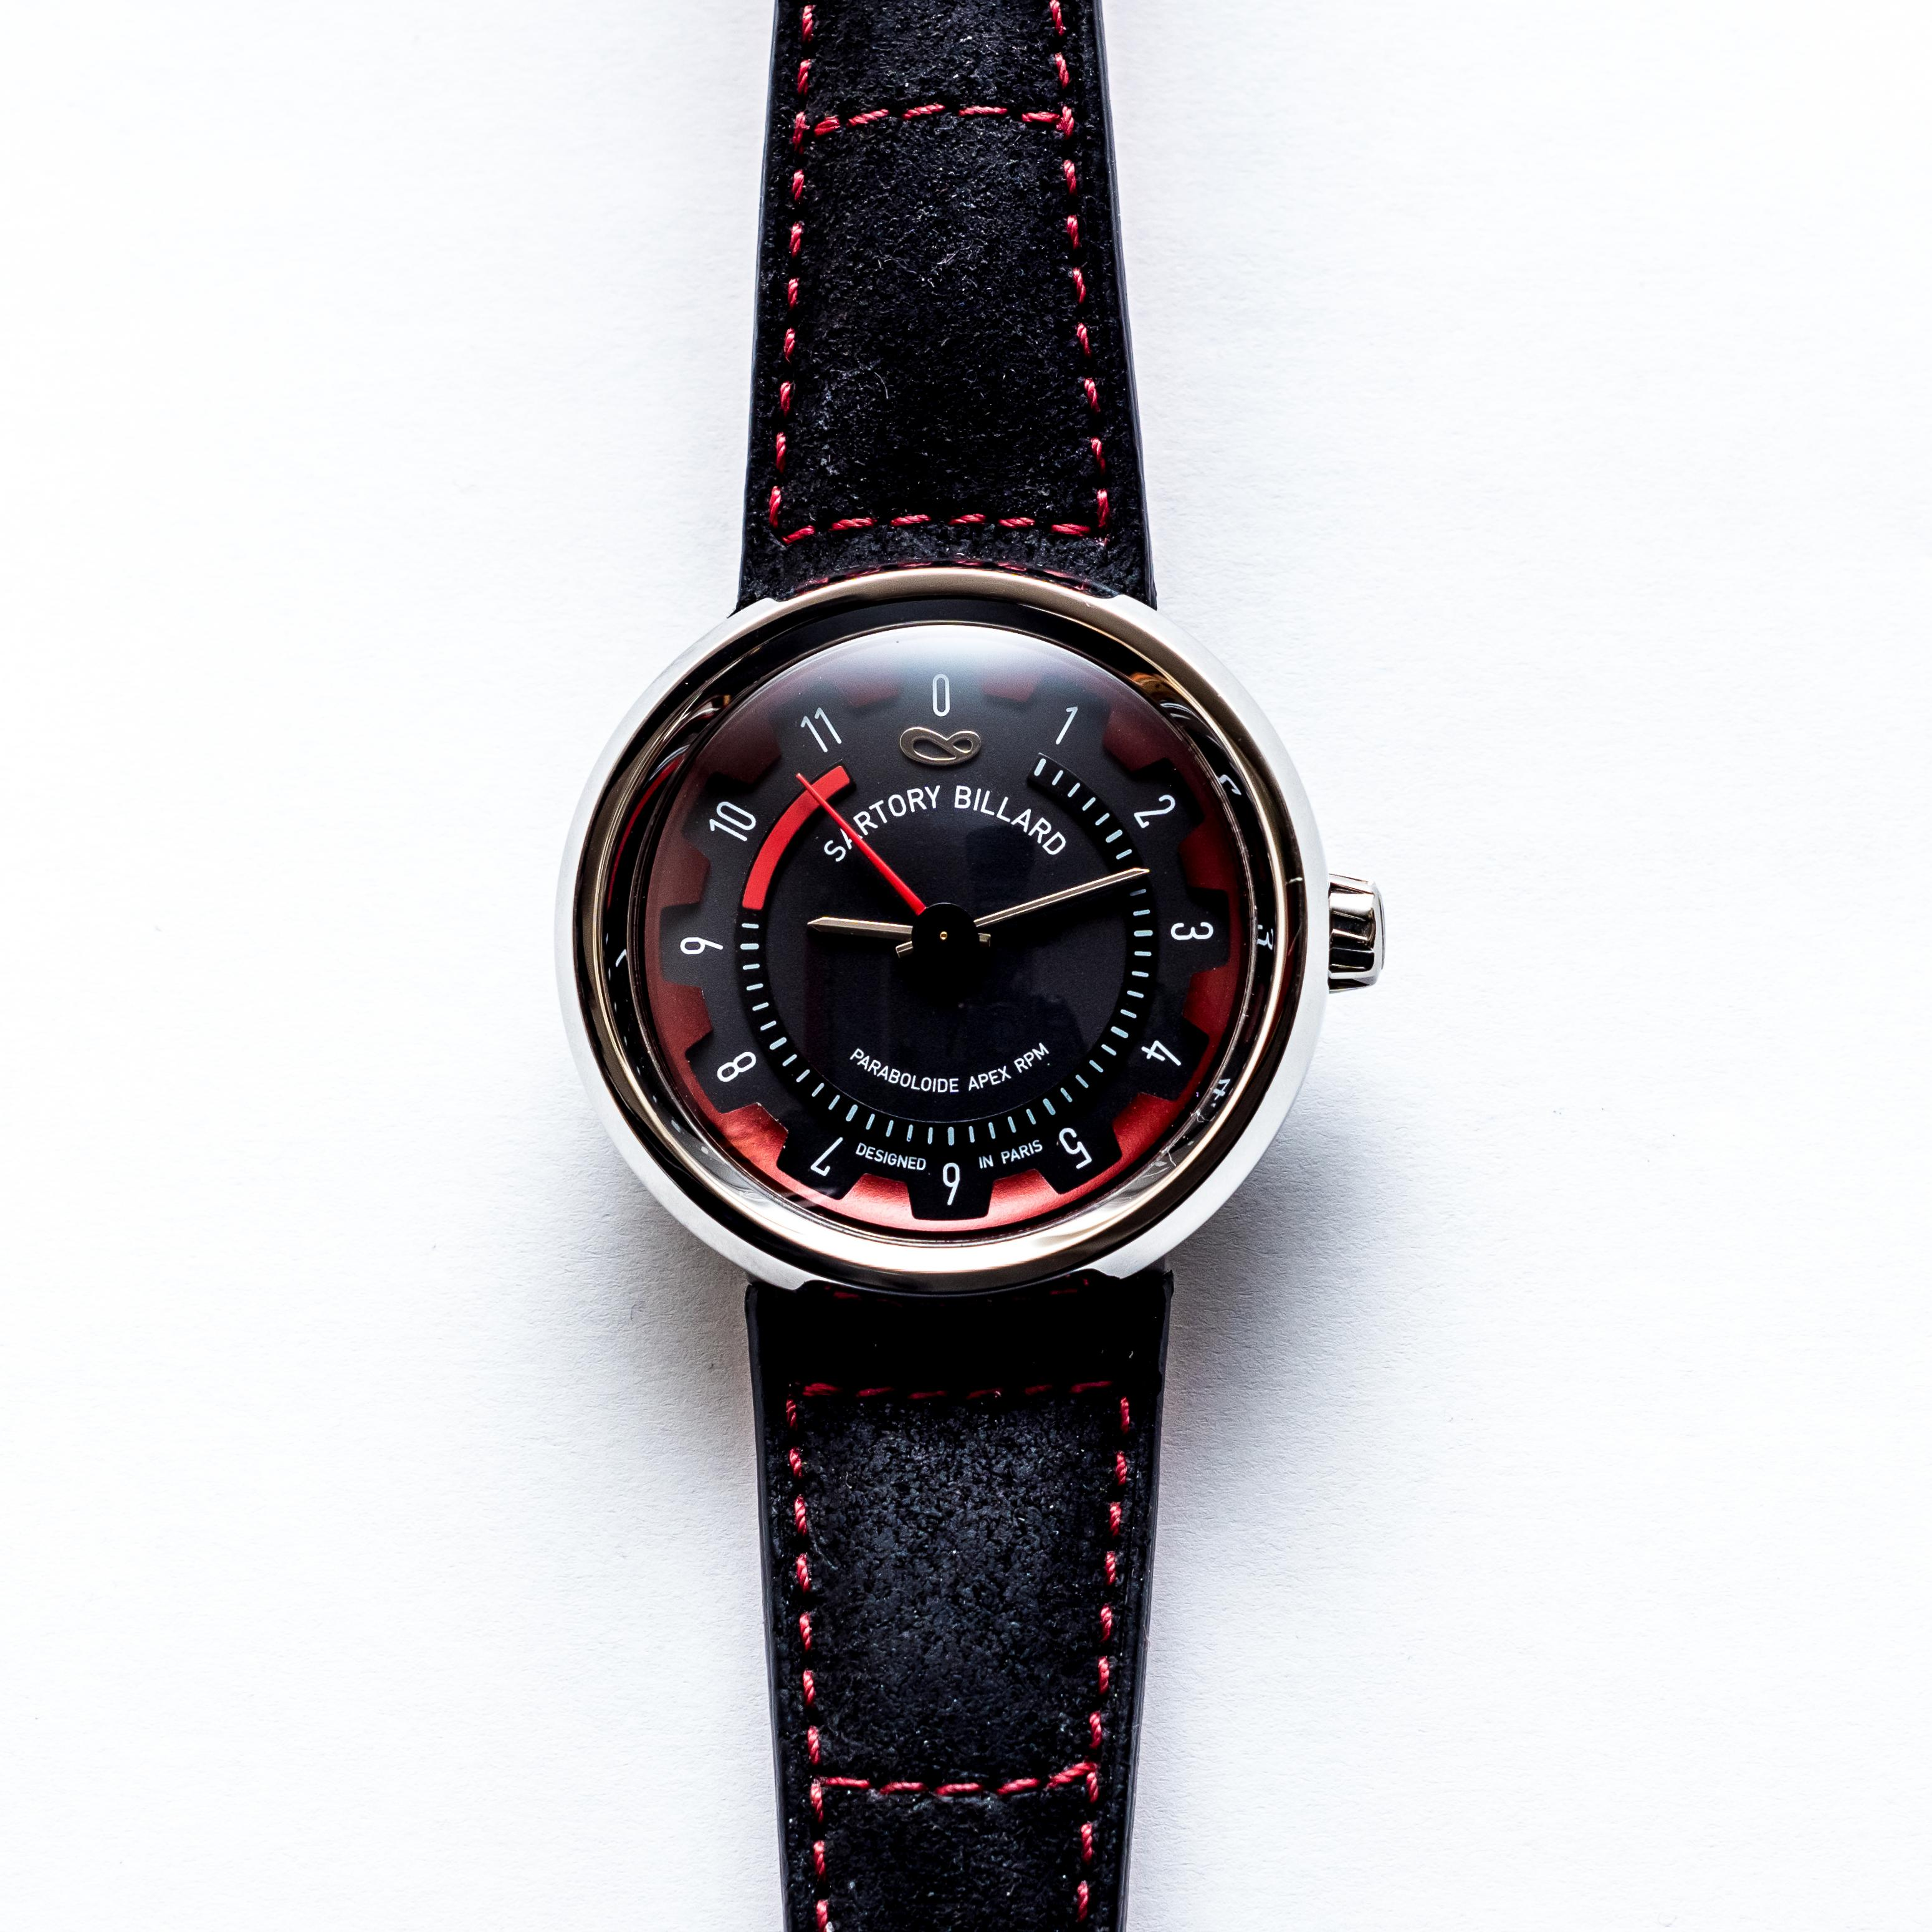 Naissance d'une nouvelle montre française : SARTORY BILLARD RPM01 - Page 2 SARTORY-BILLARD-fond-blanc-face